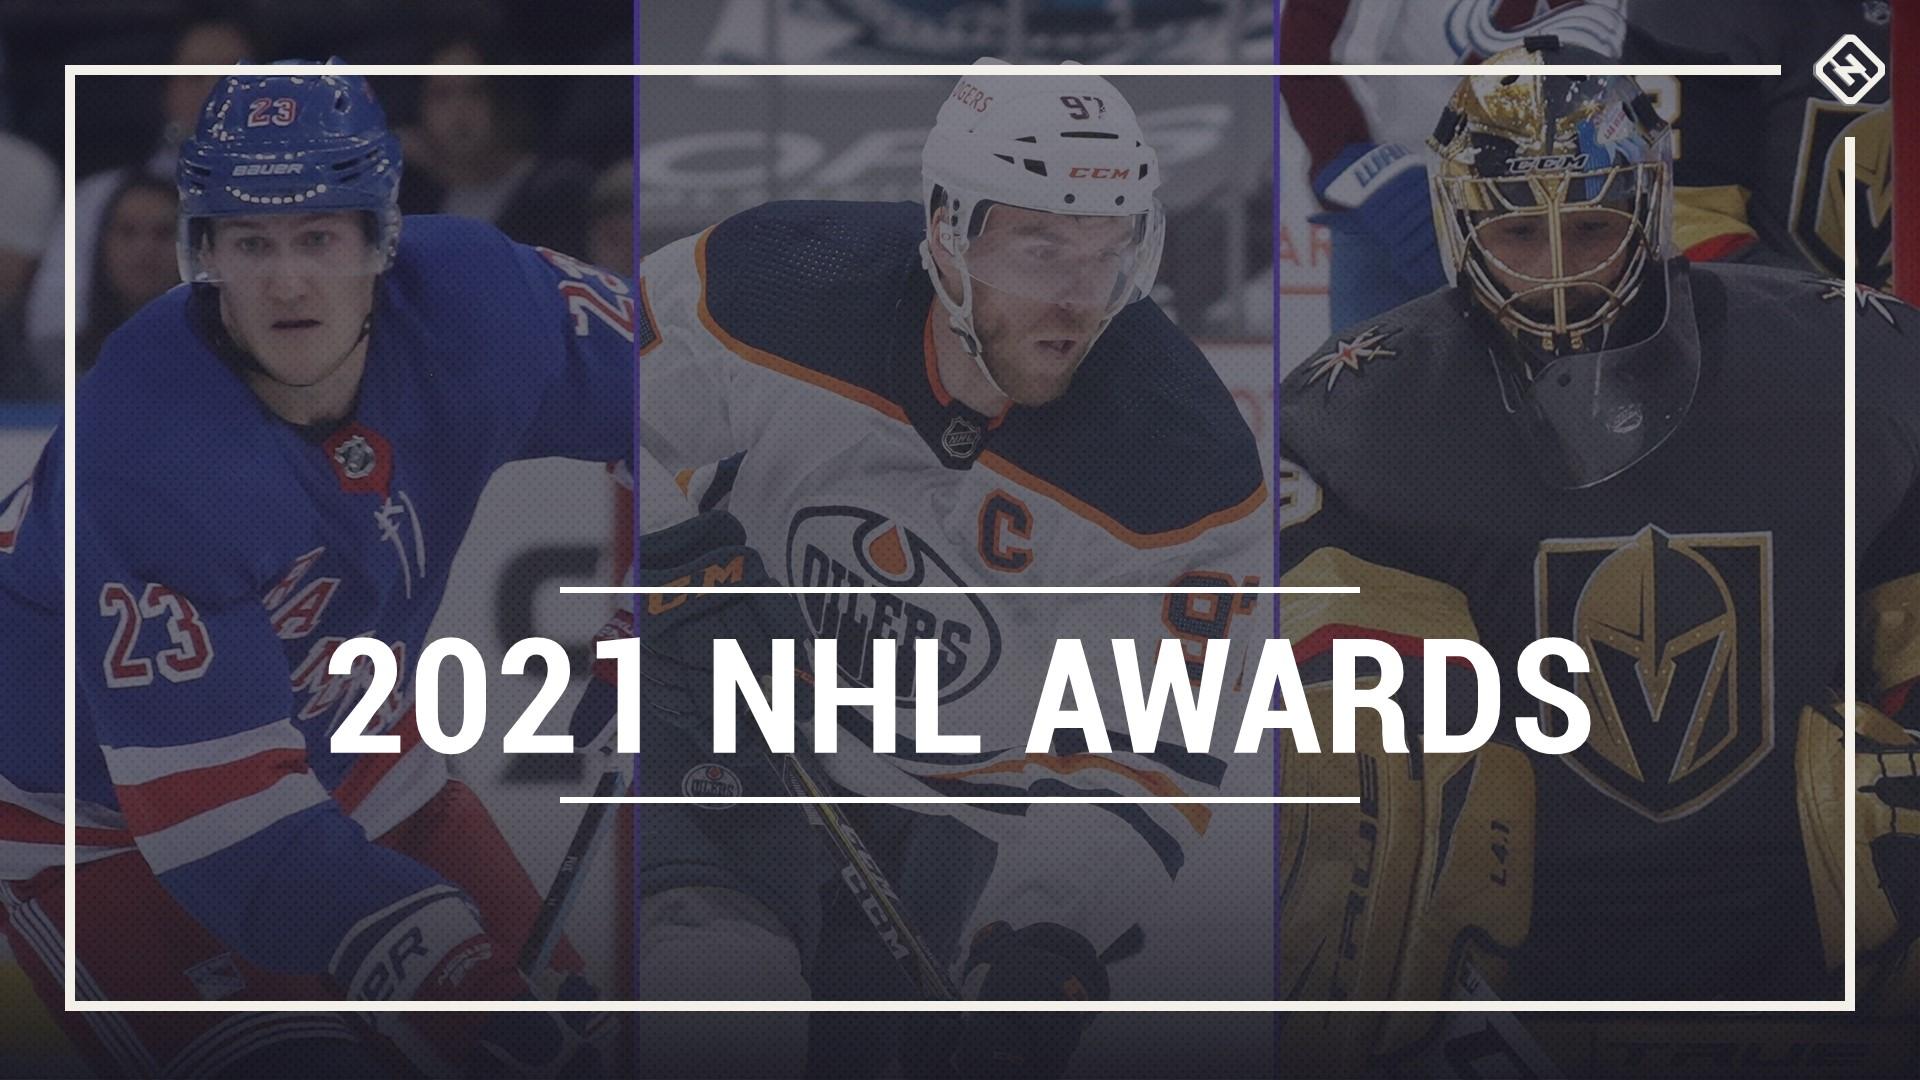 Nhl-awards-2021-061521-getty-ftrjpeg_10chxj35pwuqm1pnhqxk70yz4x